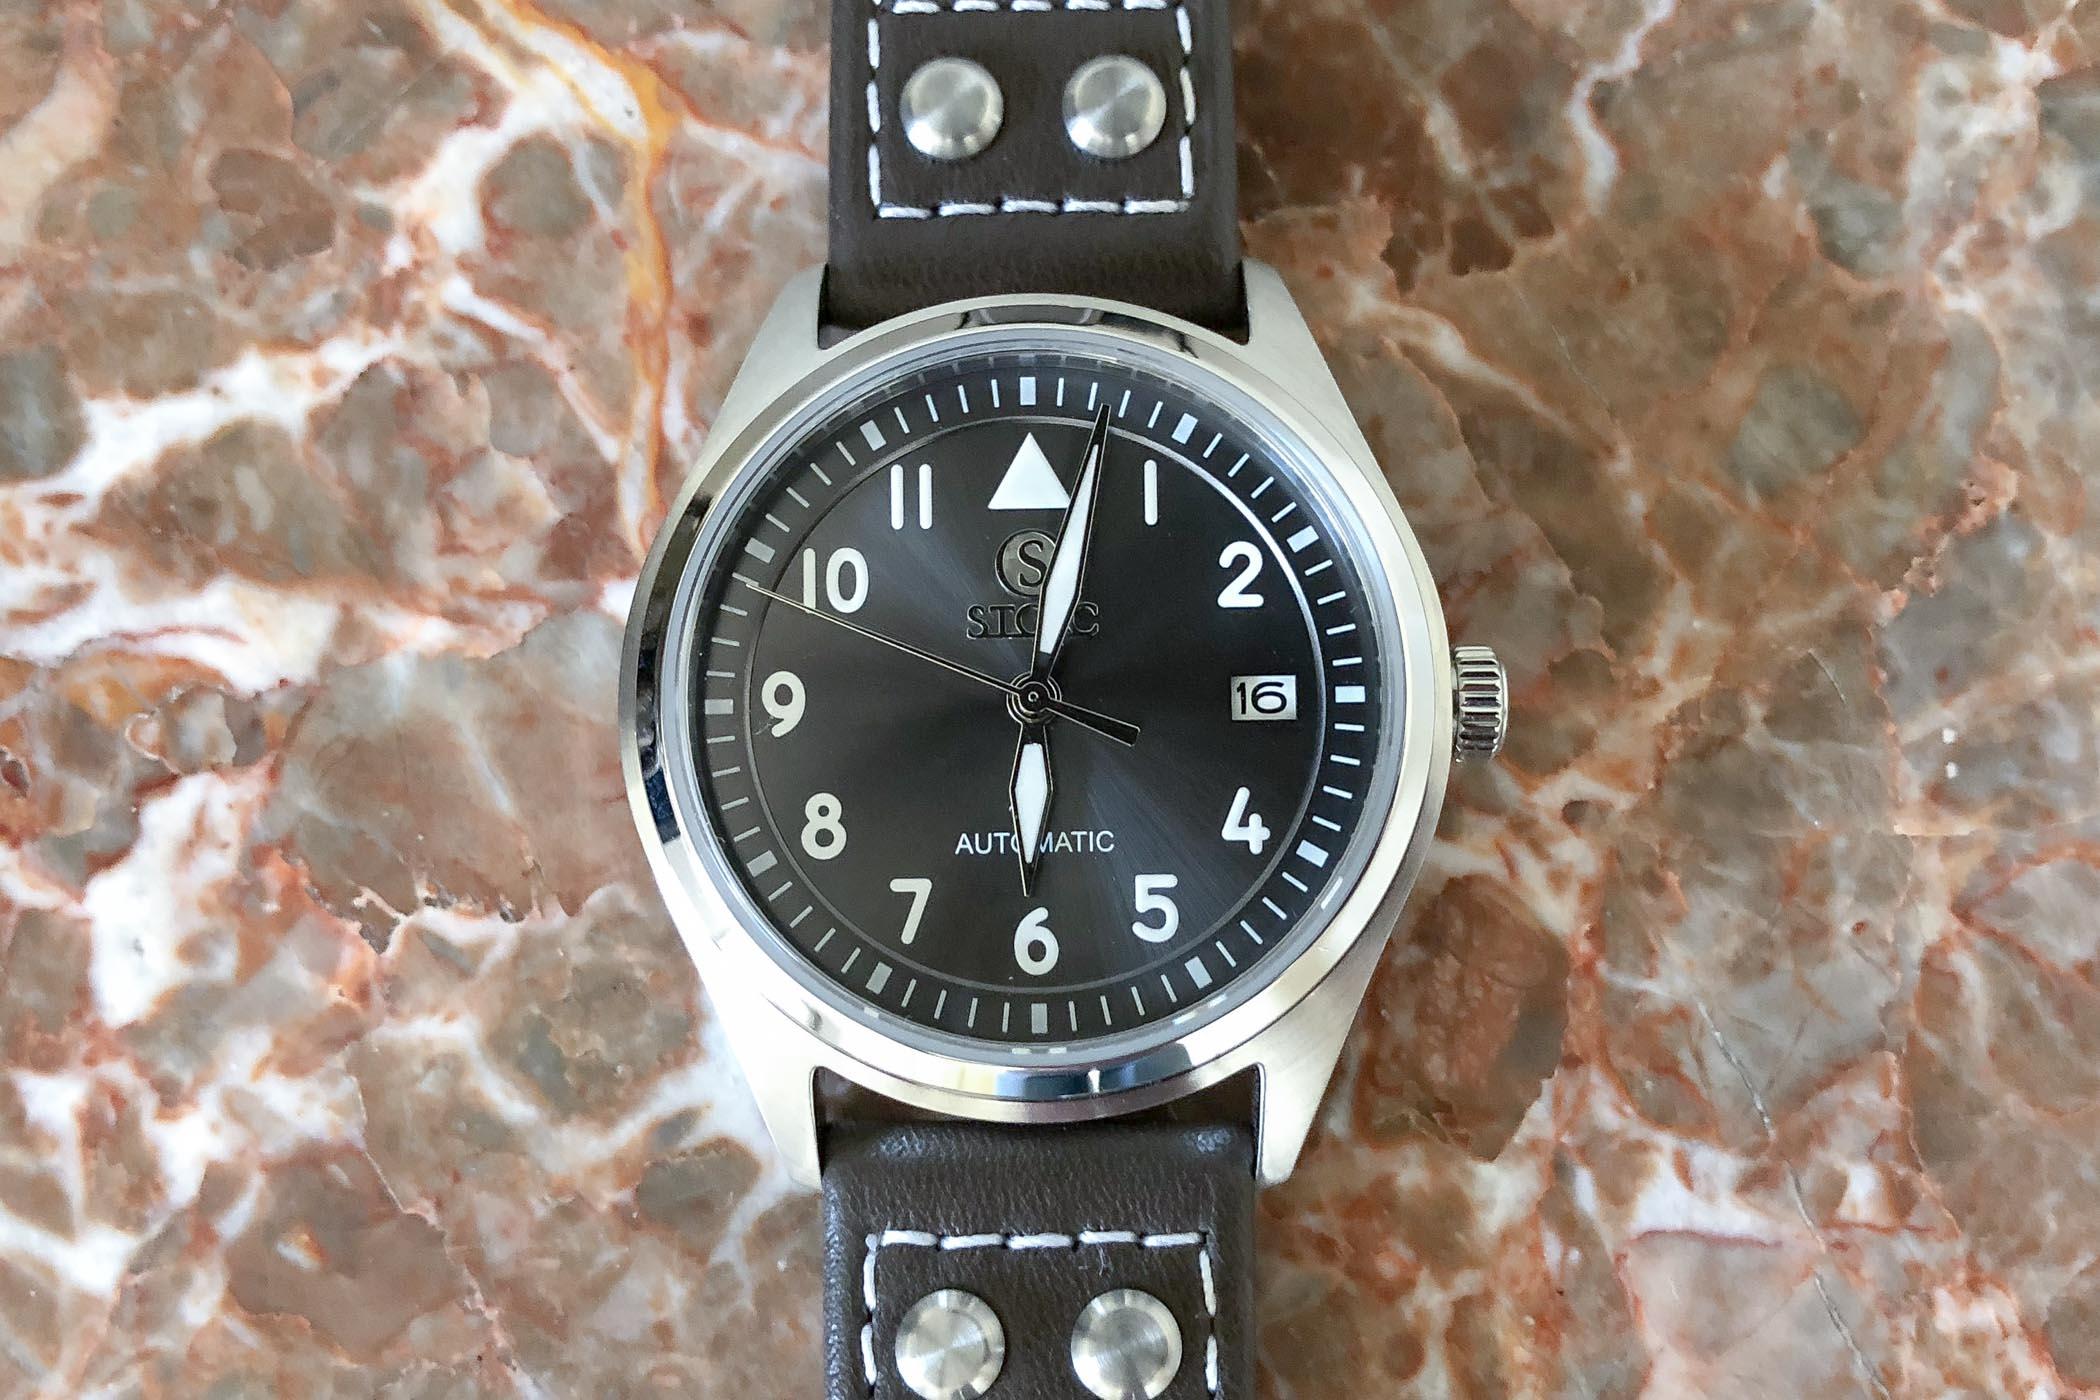 Stoic World Pilots Watch Peter Speake Marin review - 4